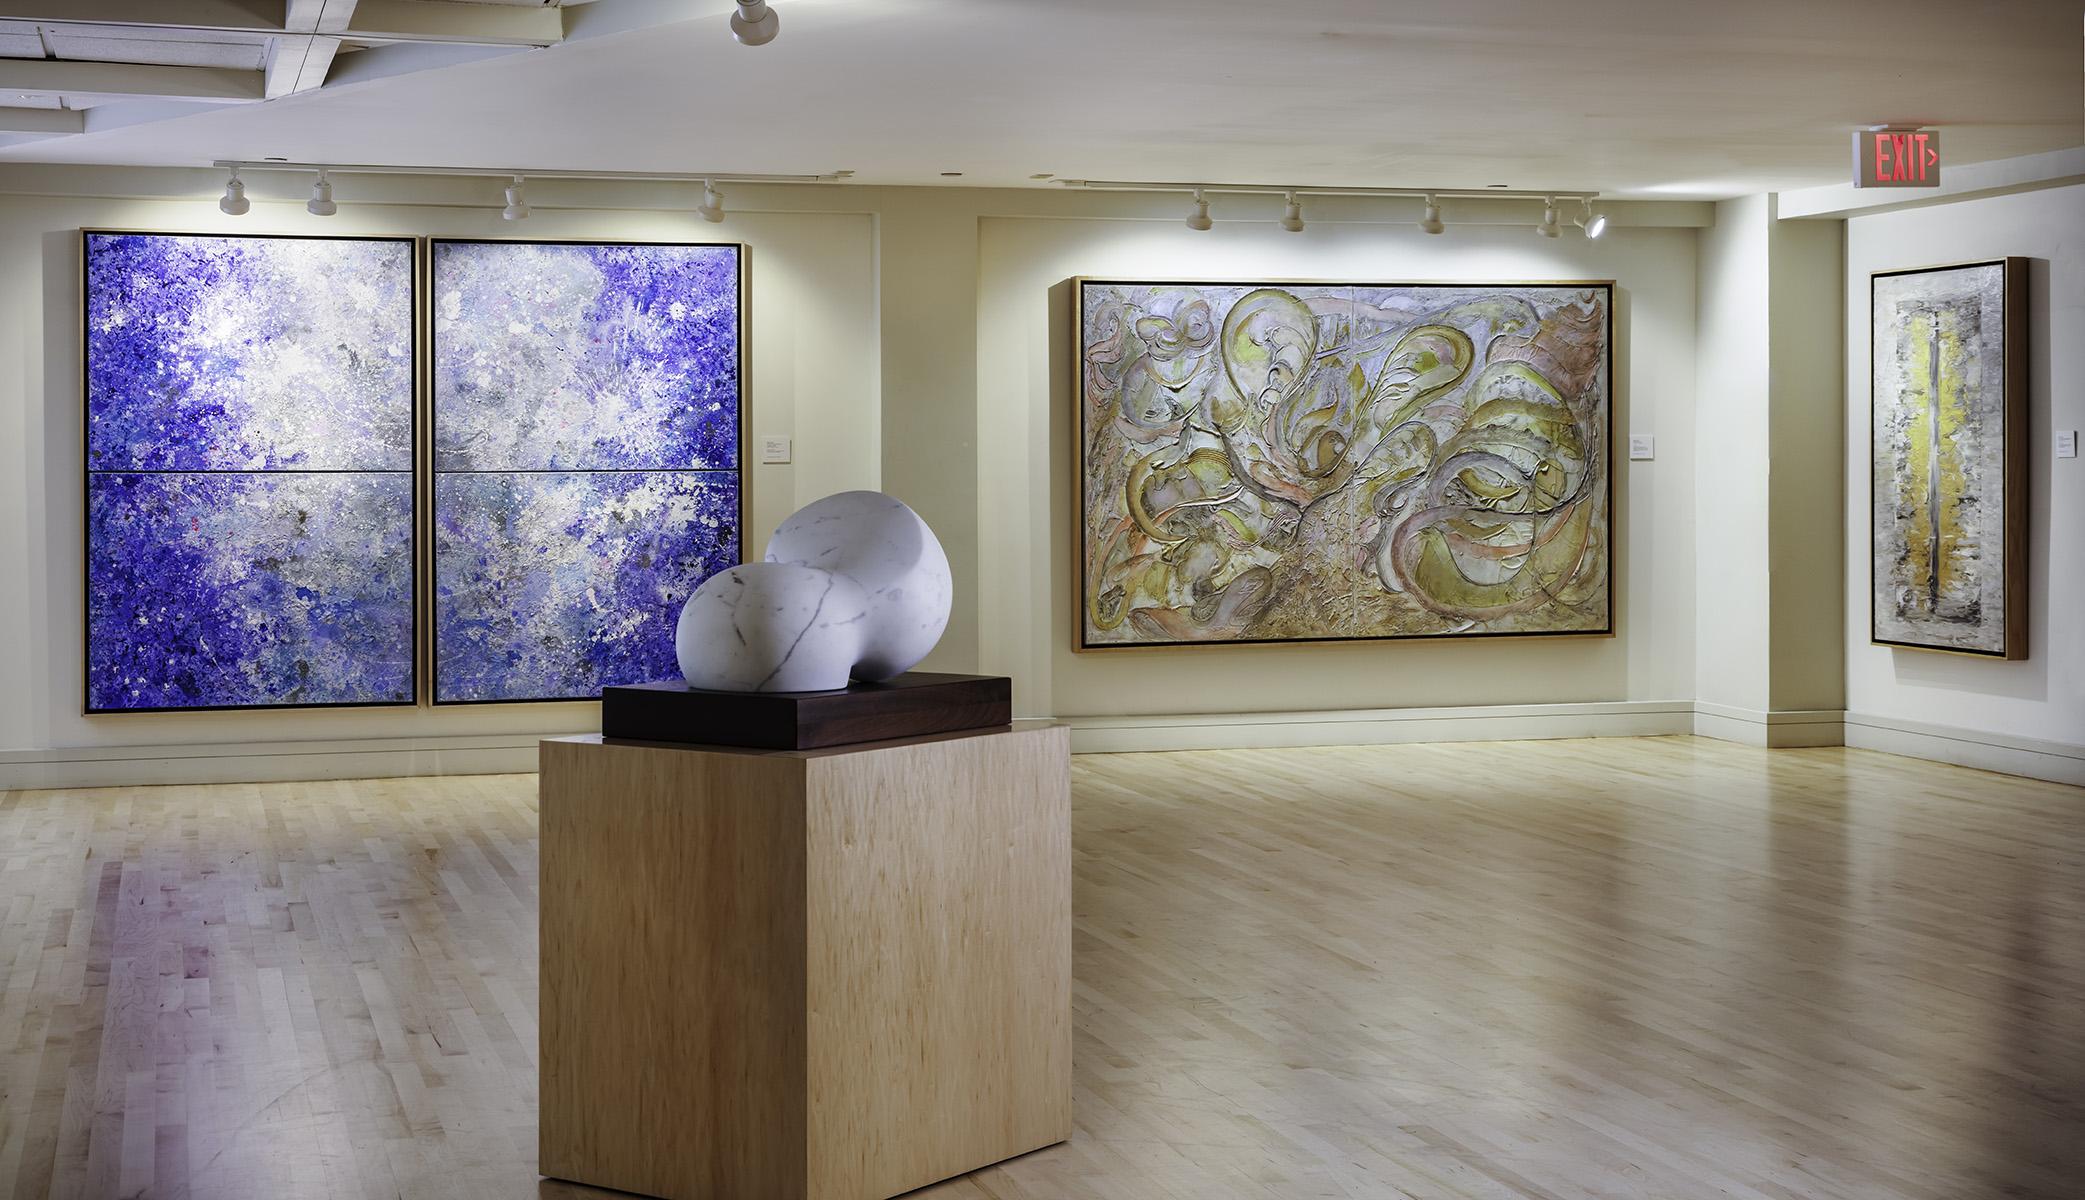 20190318_CoralSpringsMuseum_Krutick_F017 web.jpg